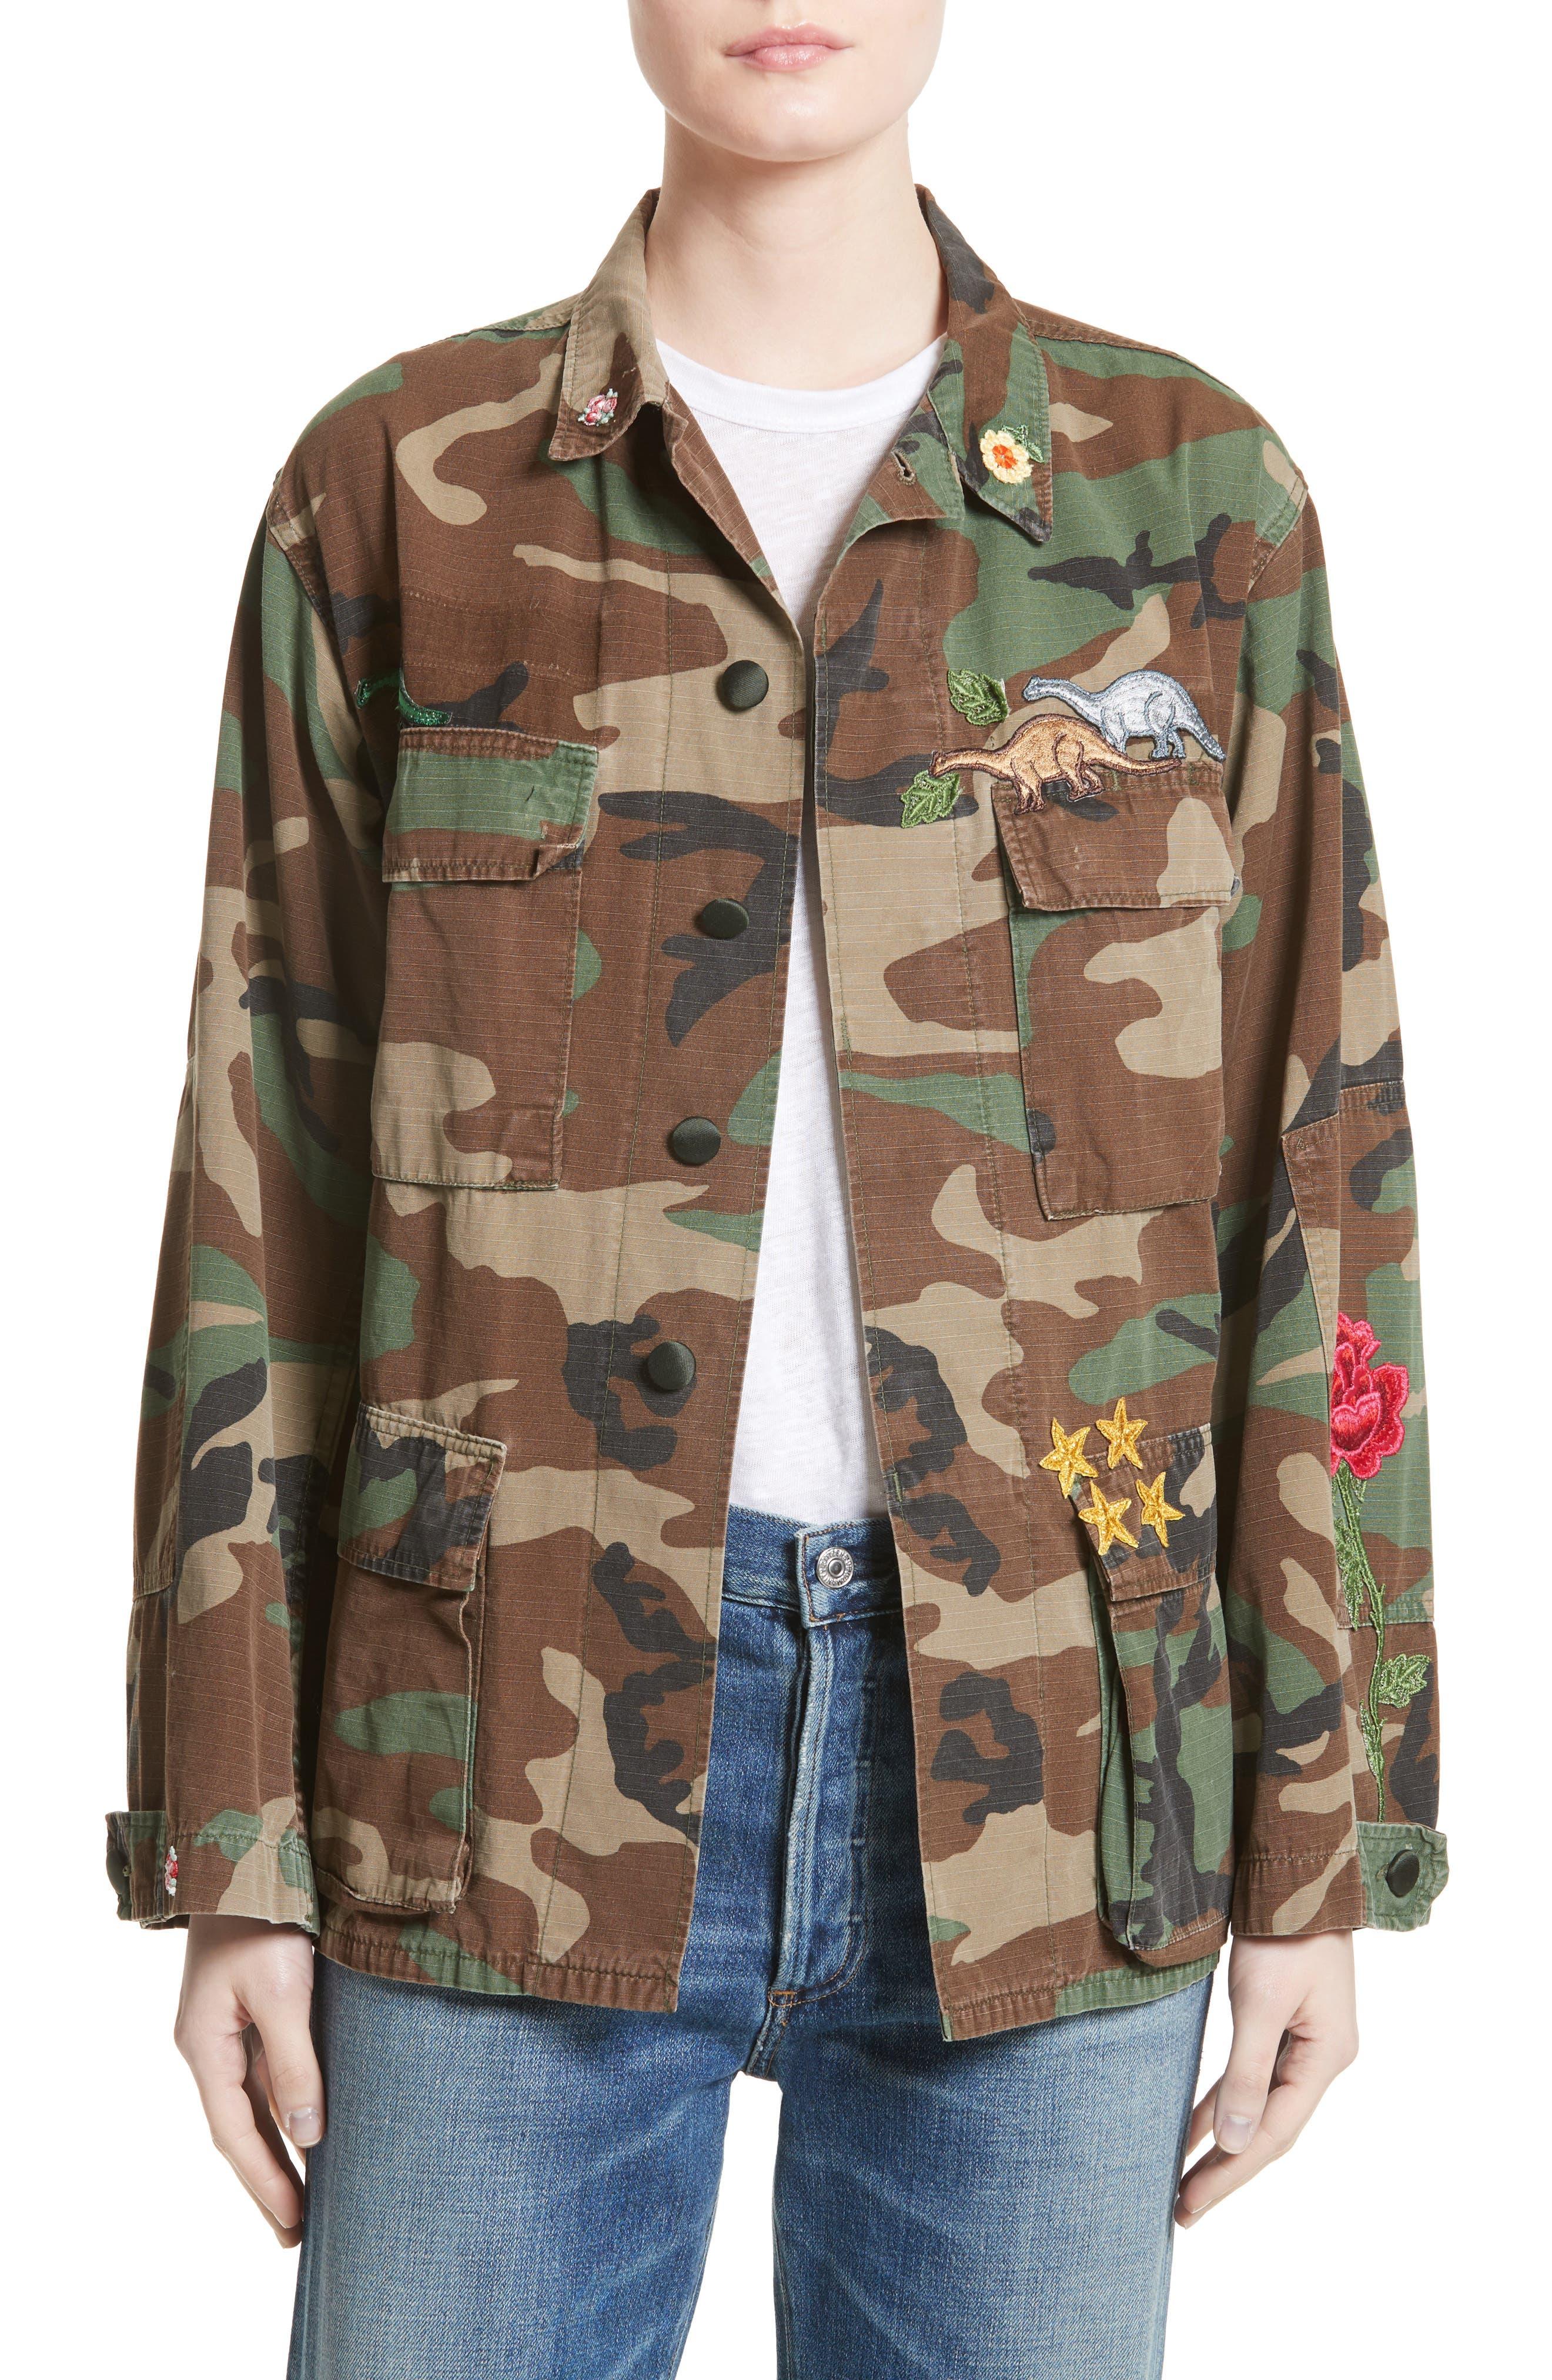 Alternate Image 1 Selected - Harvey Faircloth Vintage Woodland Camo Jacket